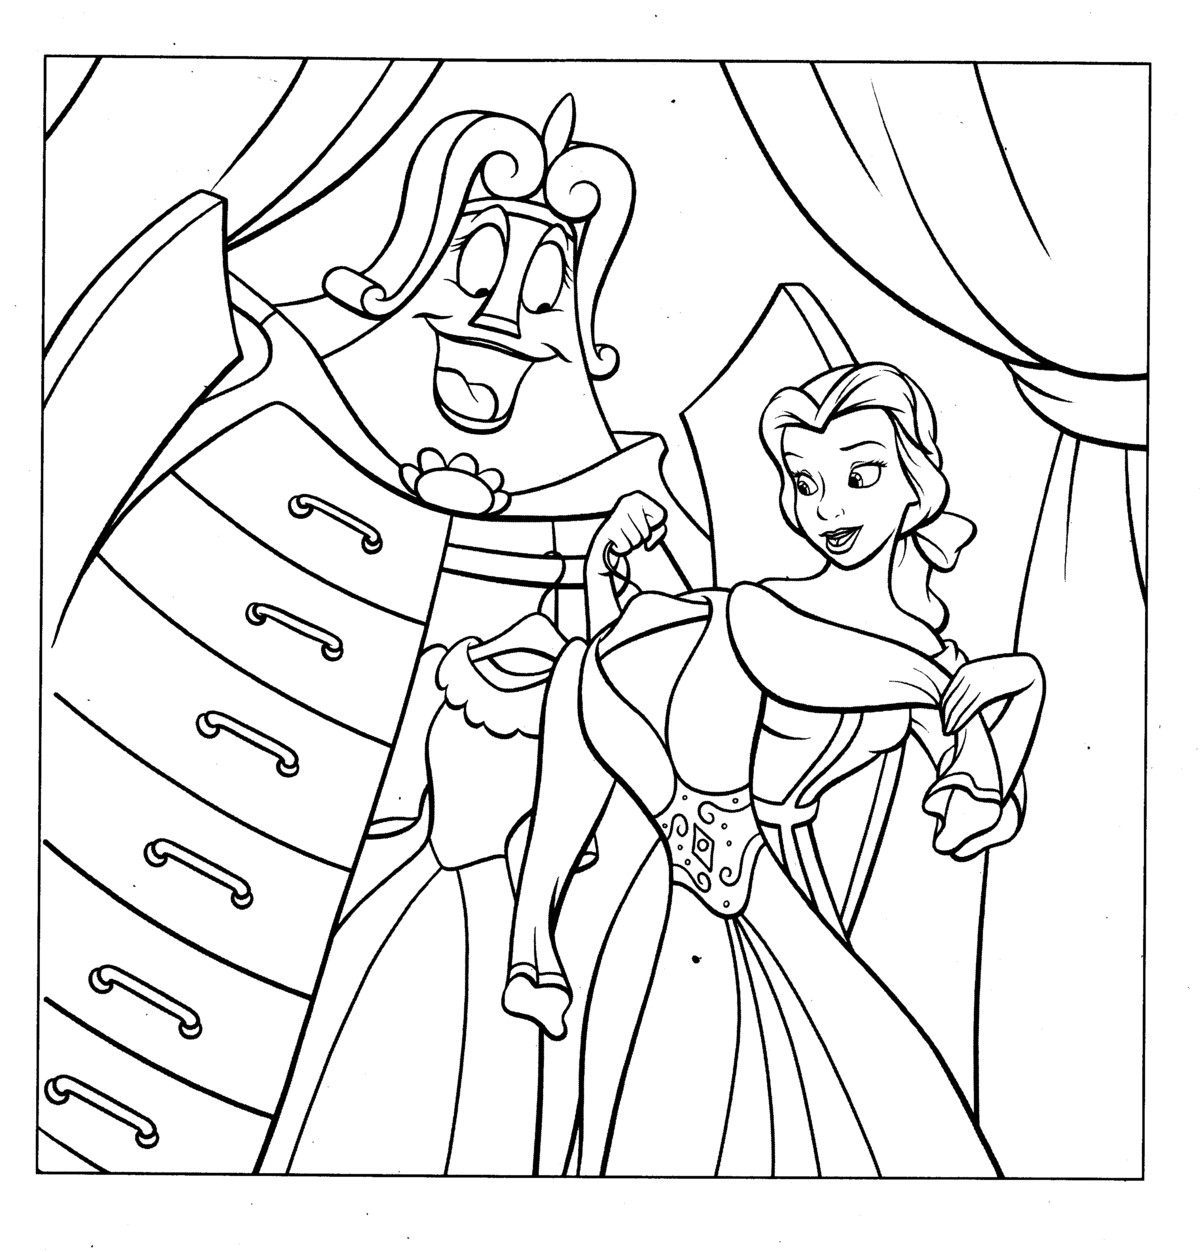 princess coloring page disney princess coloring pages ideas coloring princess page